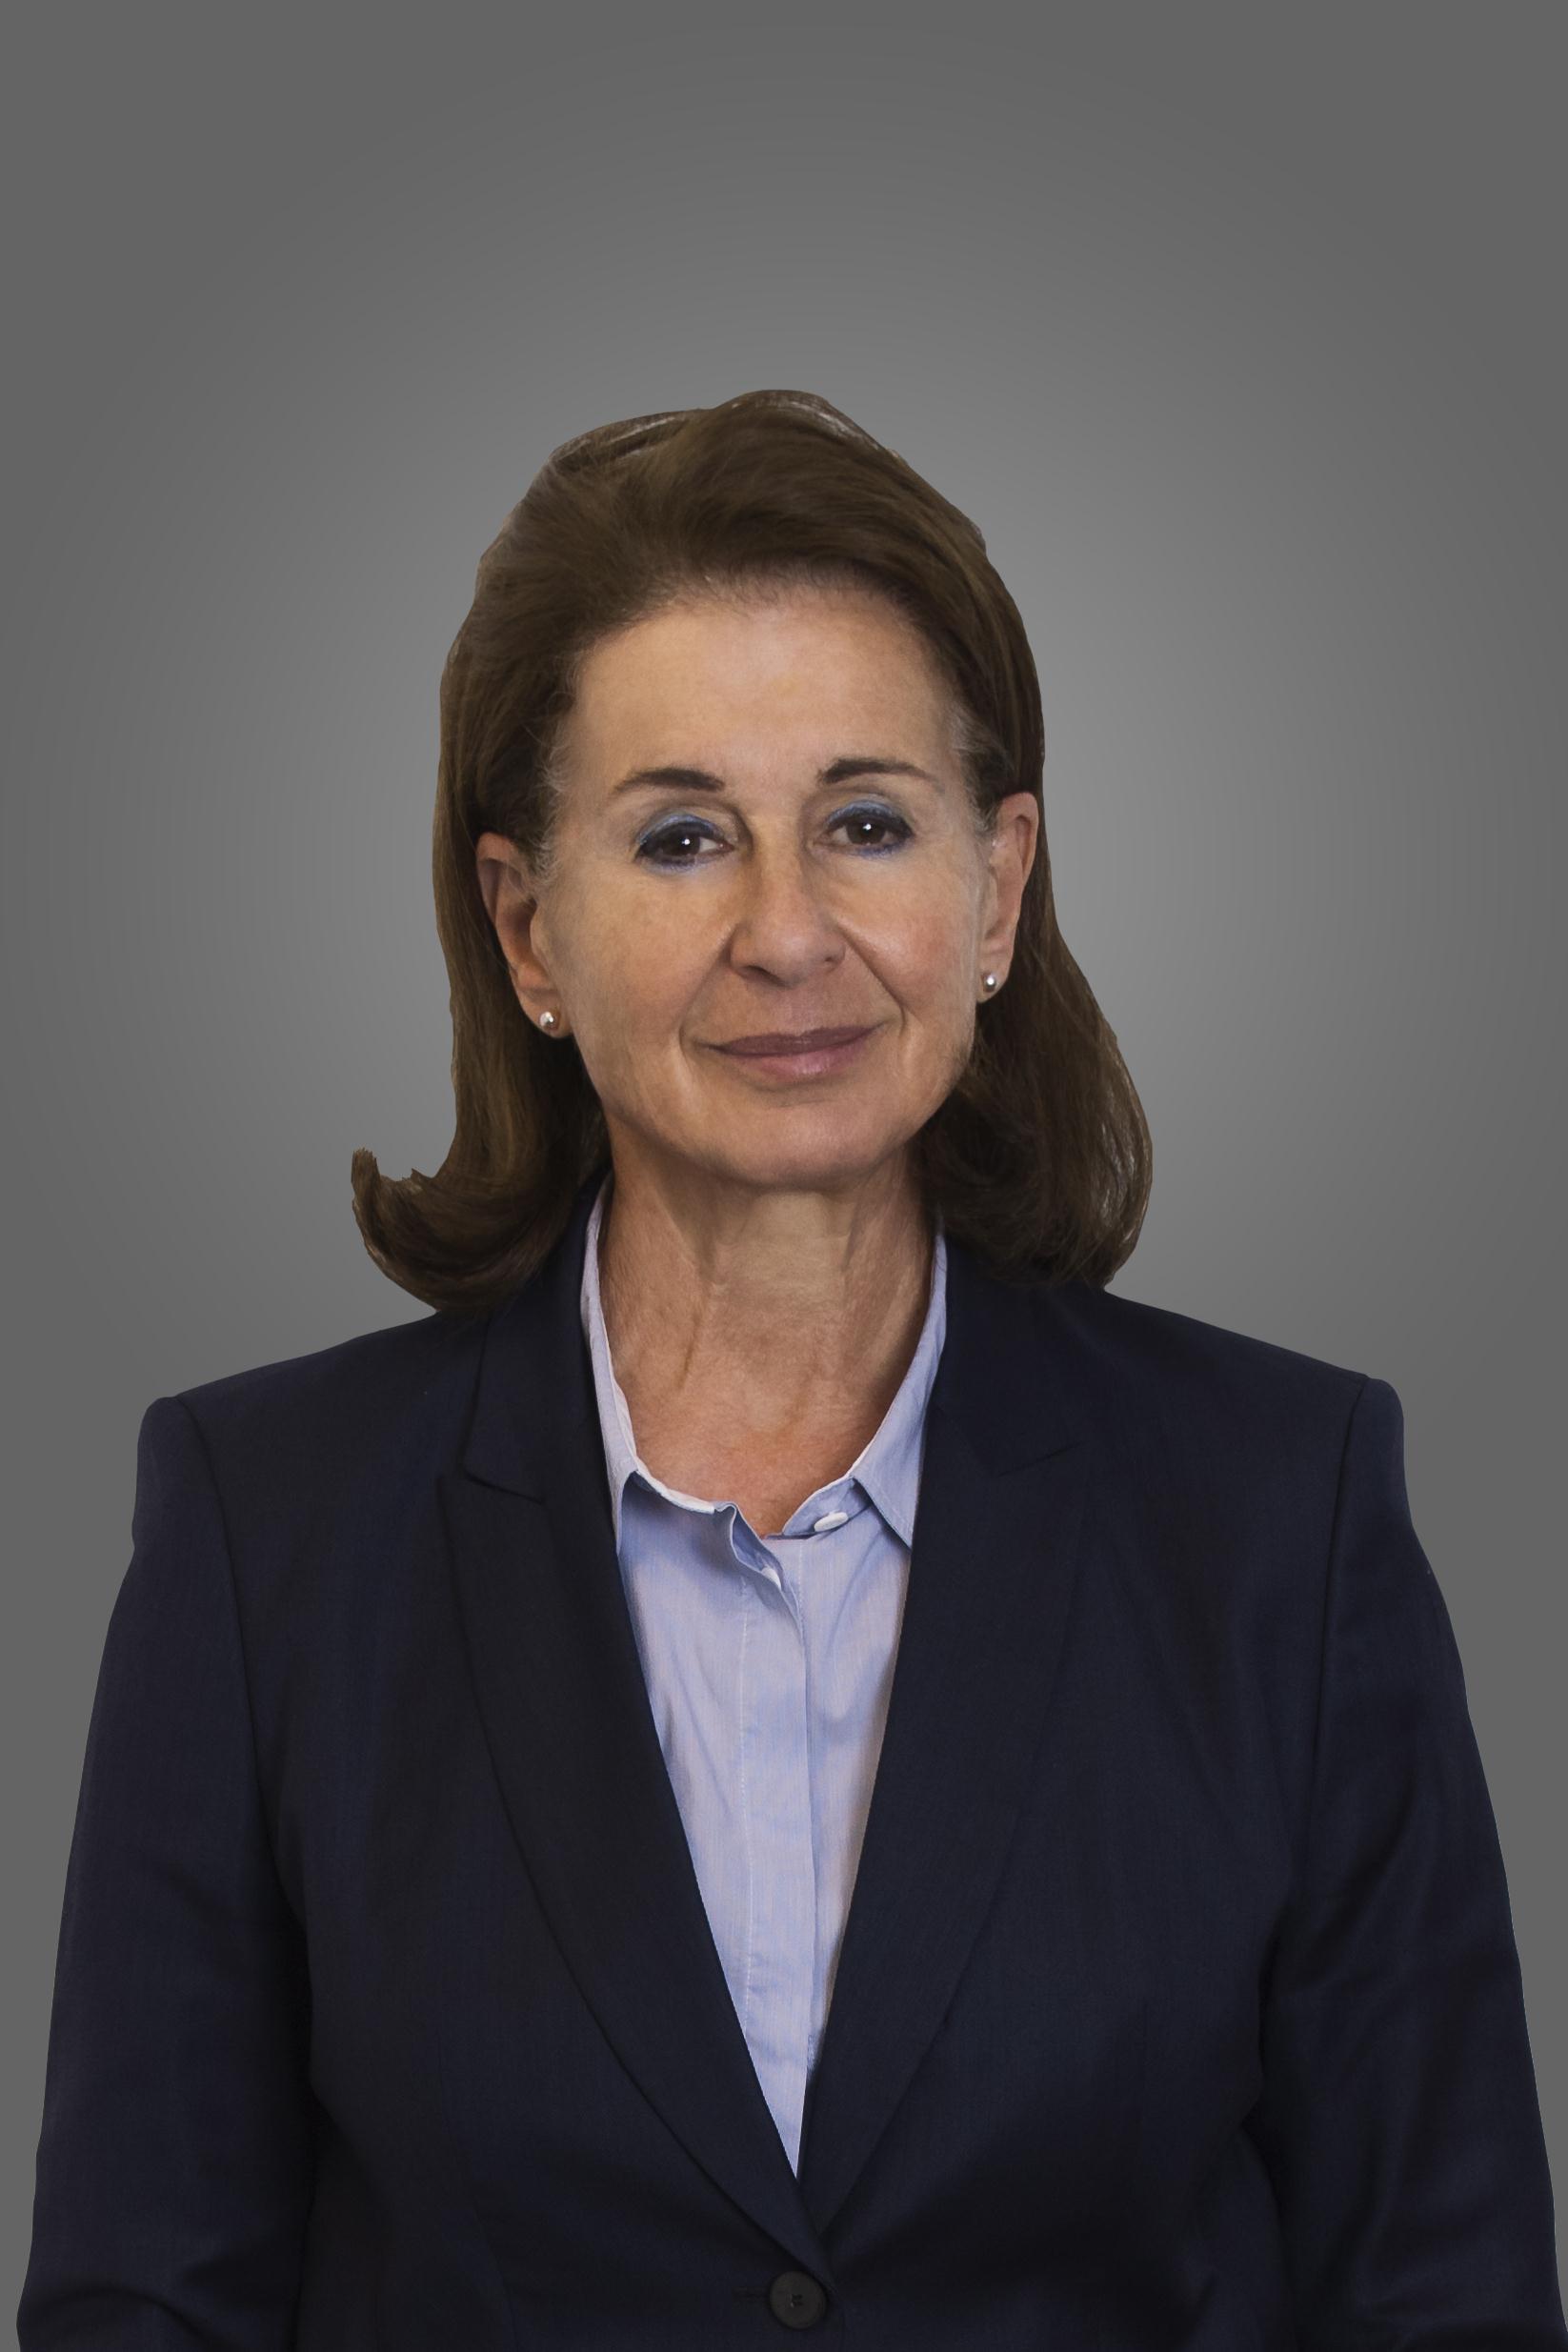 Zeinab Hashem, Managing Director and CEO of ADIB Capital - Egypt